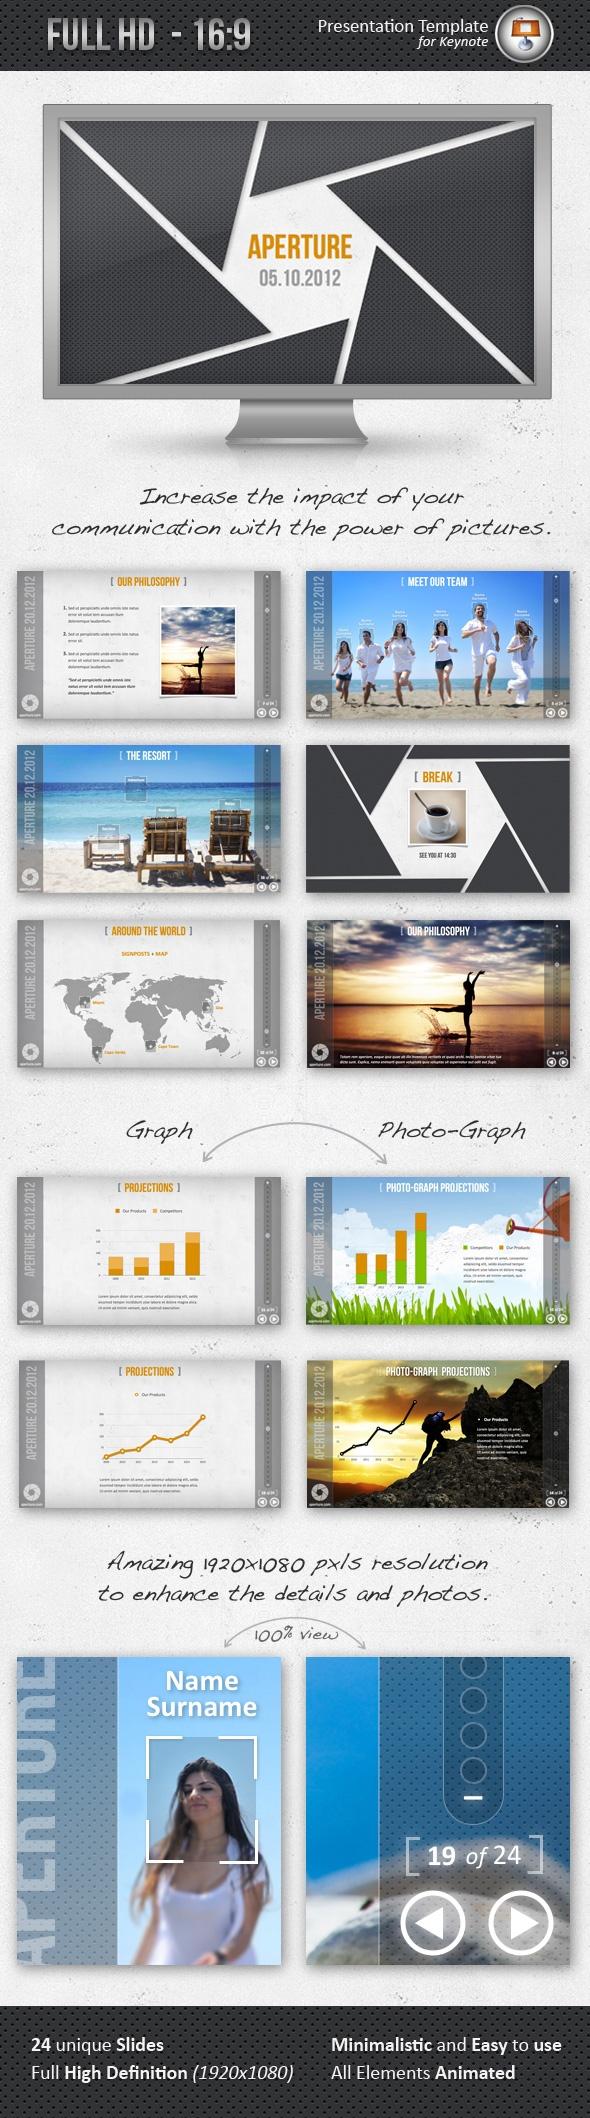 Aperture Keynote template - PowerPoint & Keynote - Creattica